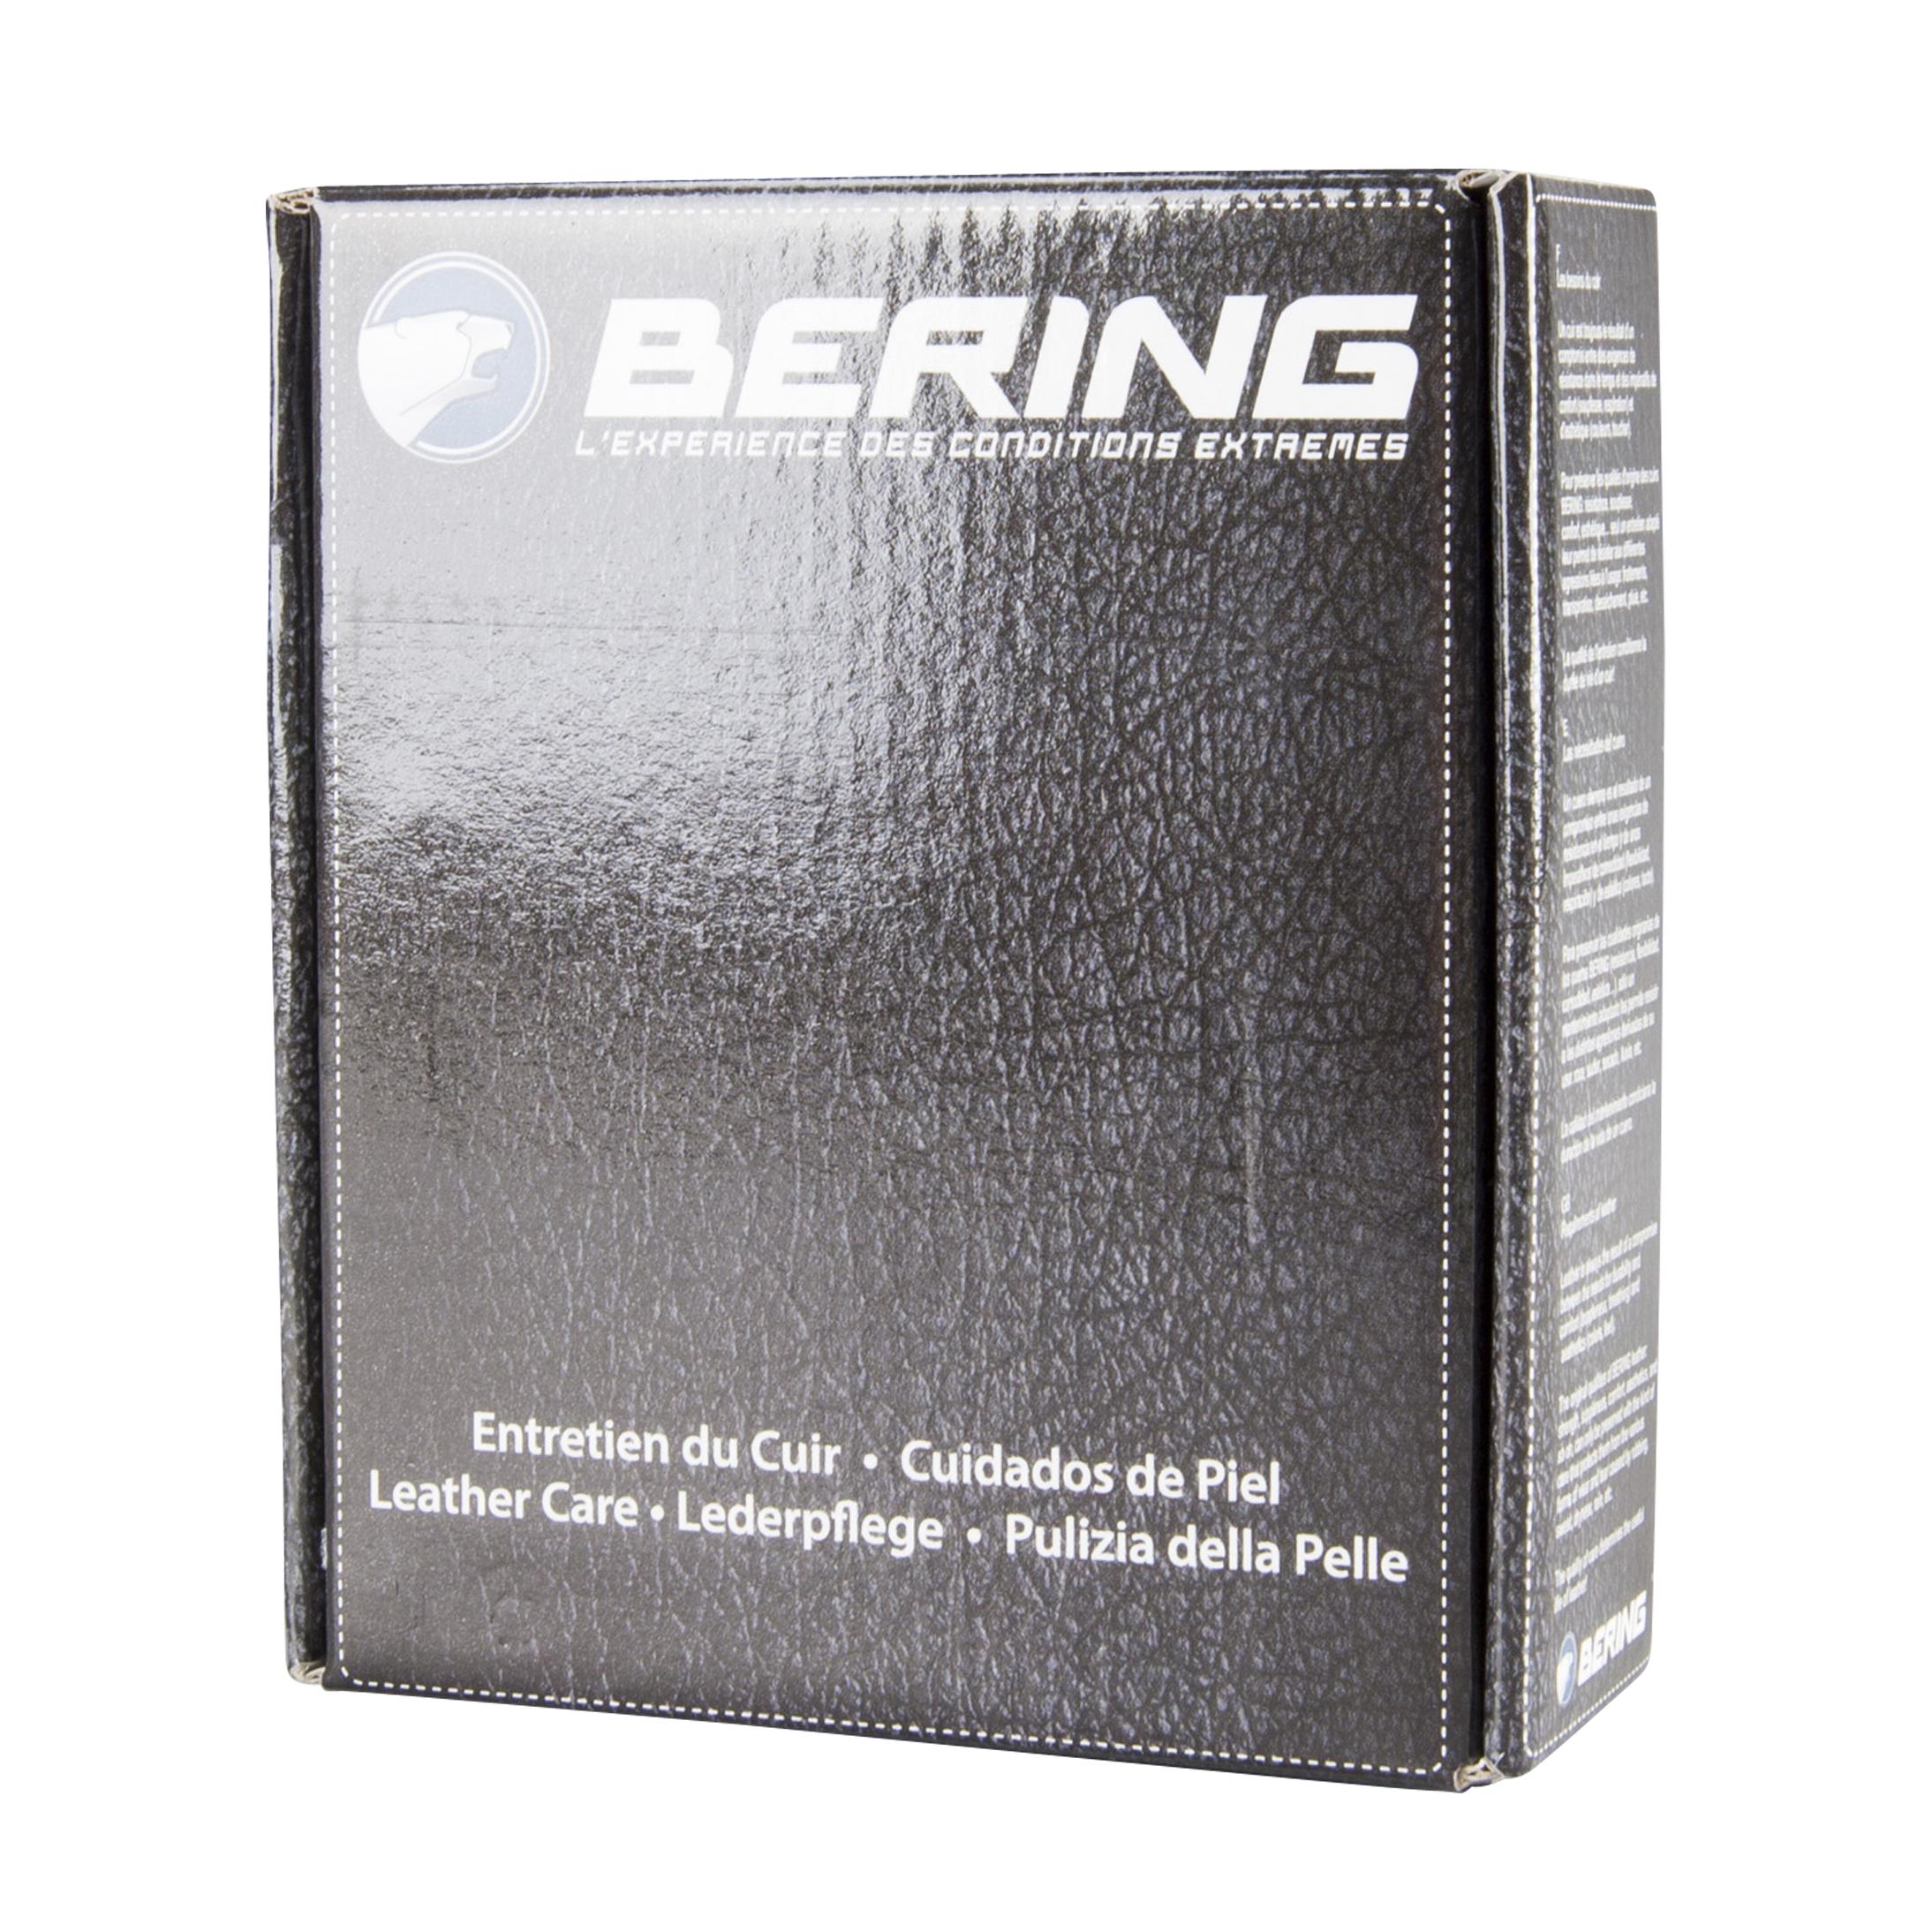 Bering Kit Cura Pelle